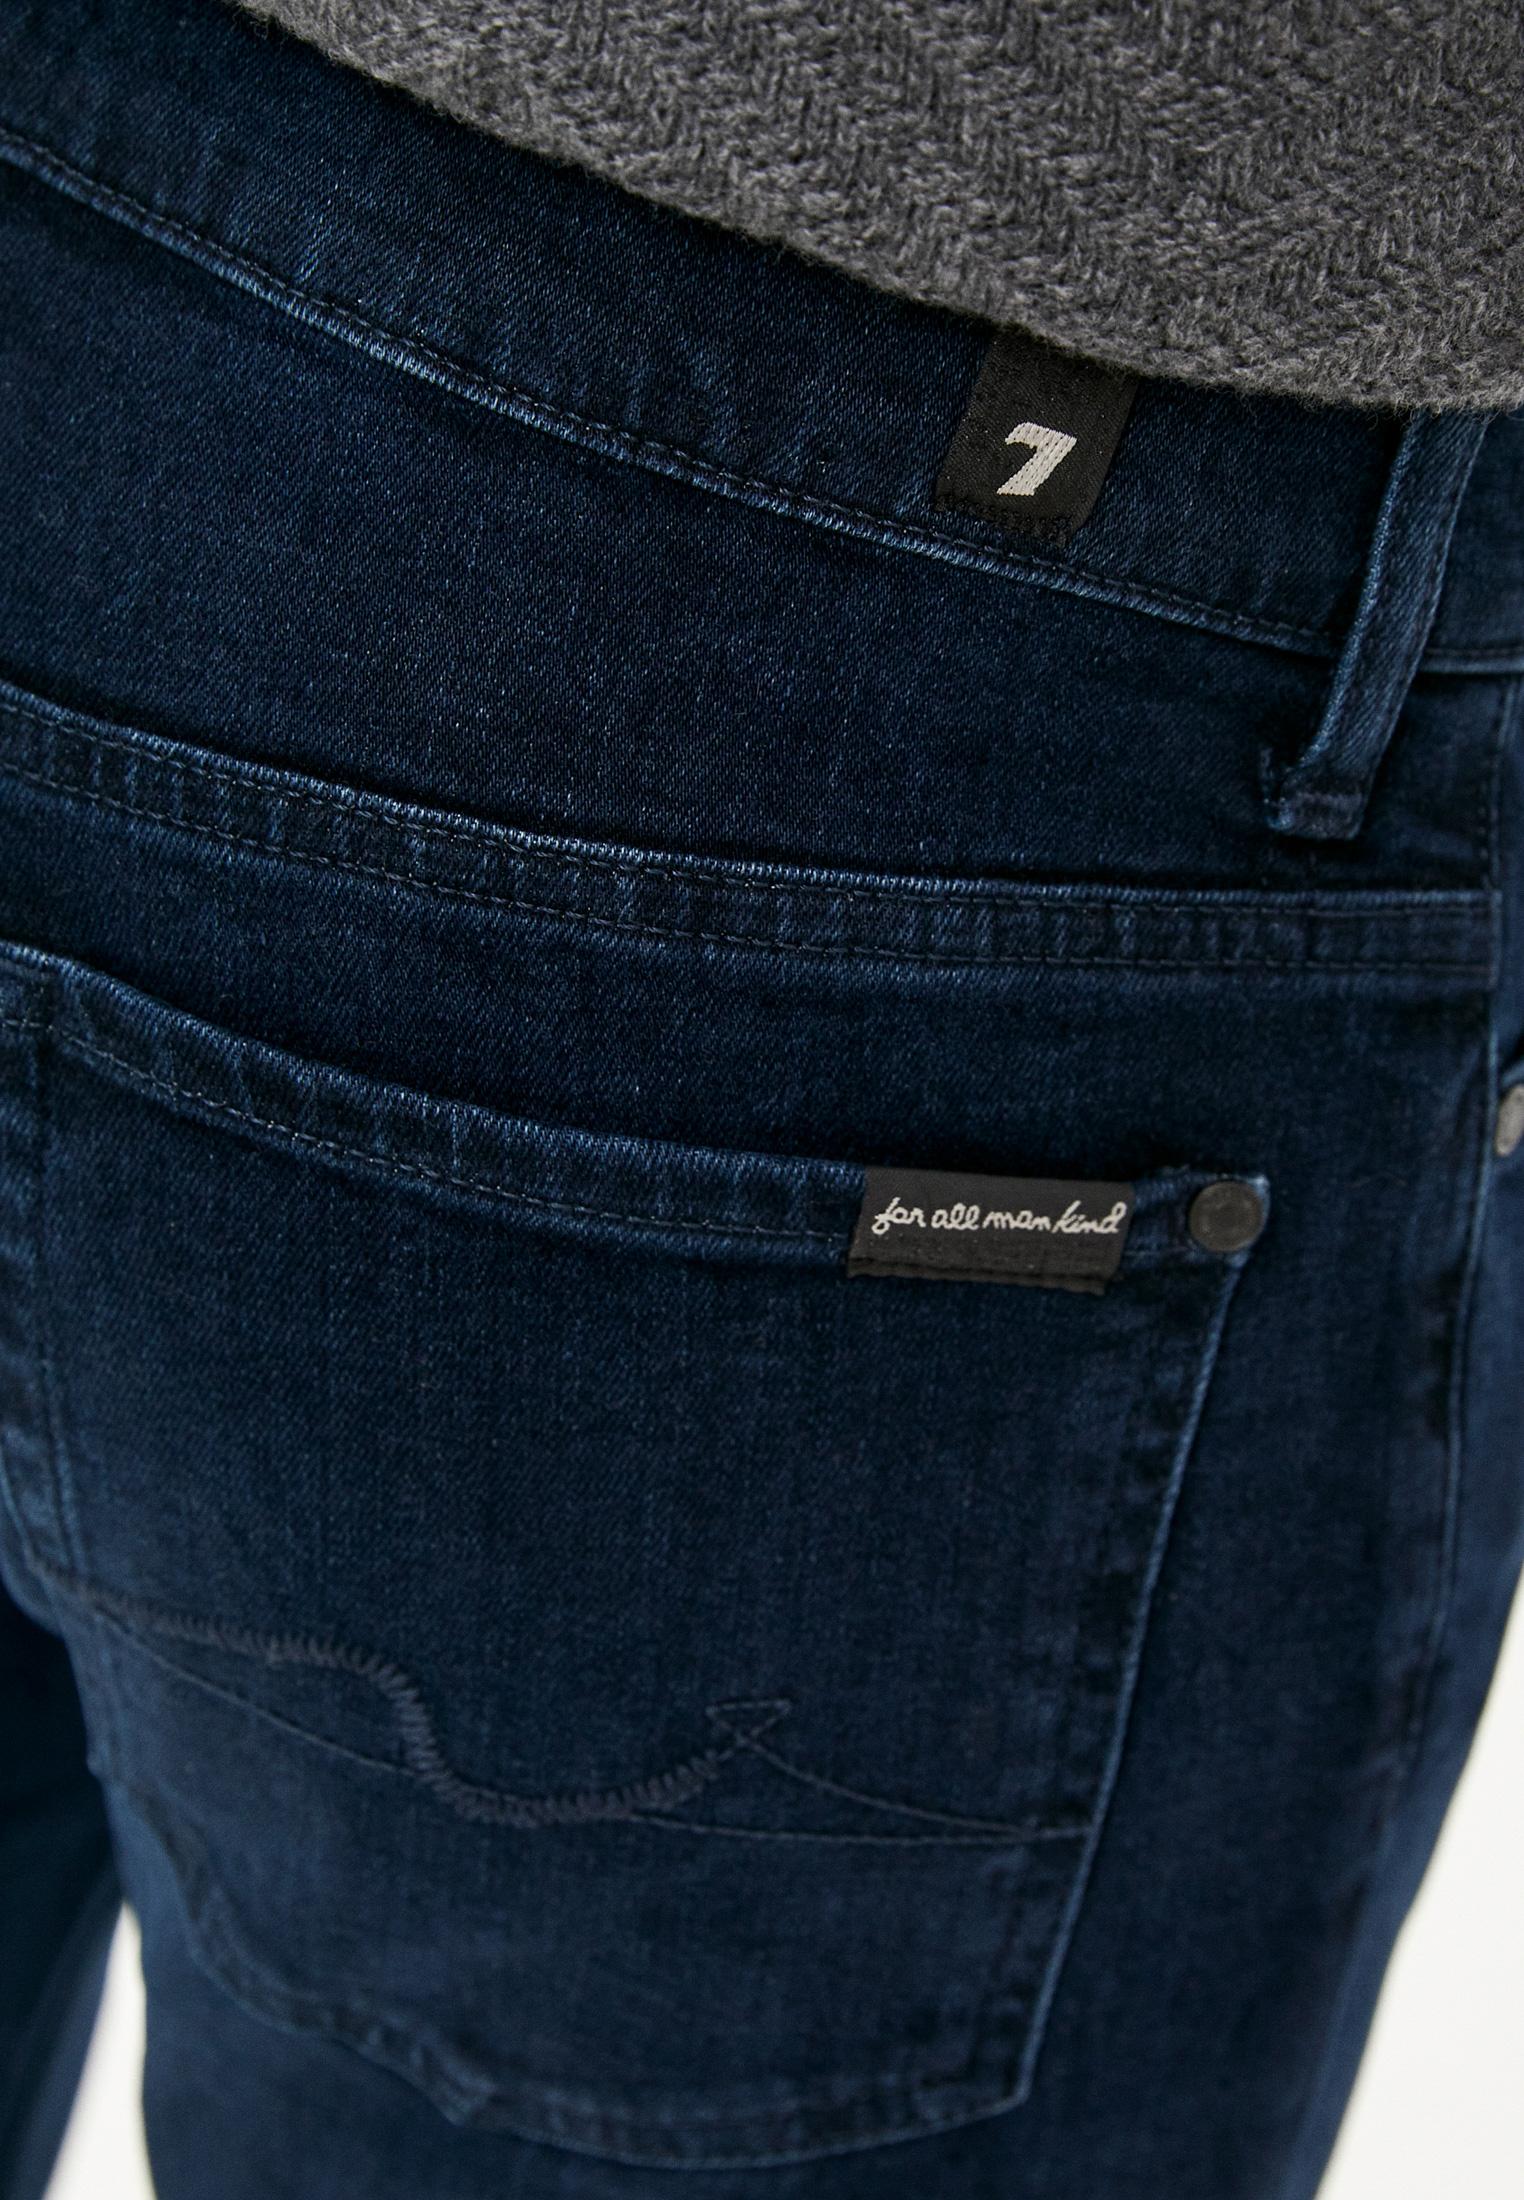 Зауженные джинсы 7 For All Mankind (7 Фо Олл Мэнкайнд) JSD4R460LL: изображение 5